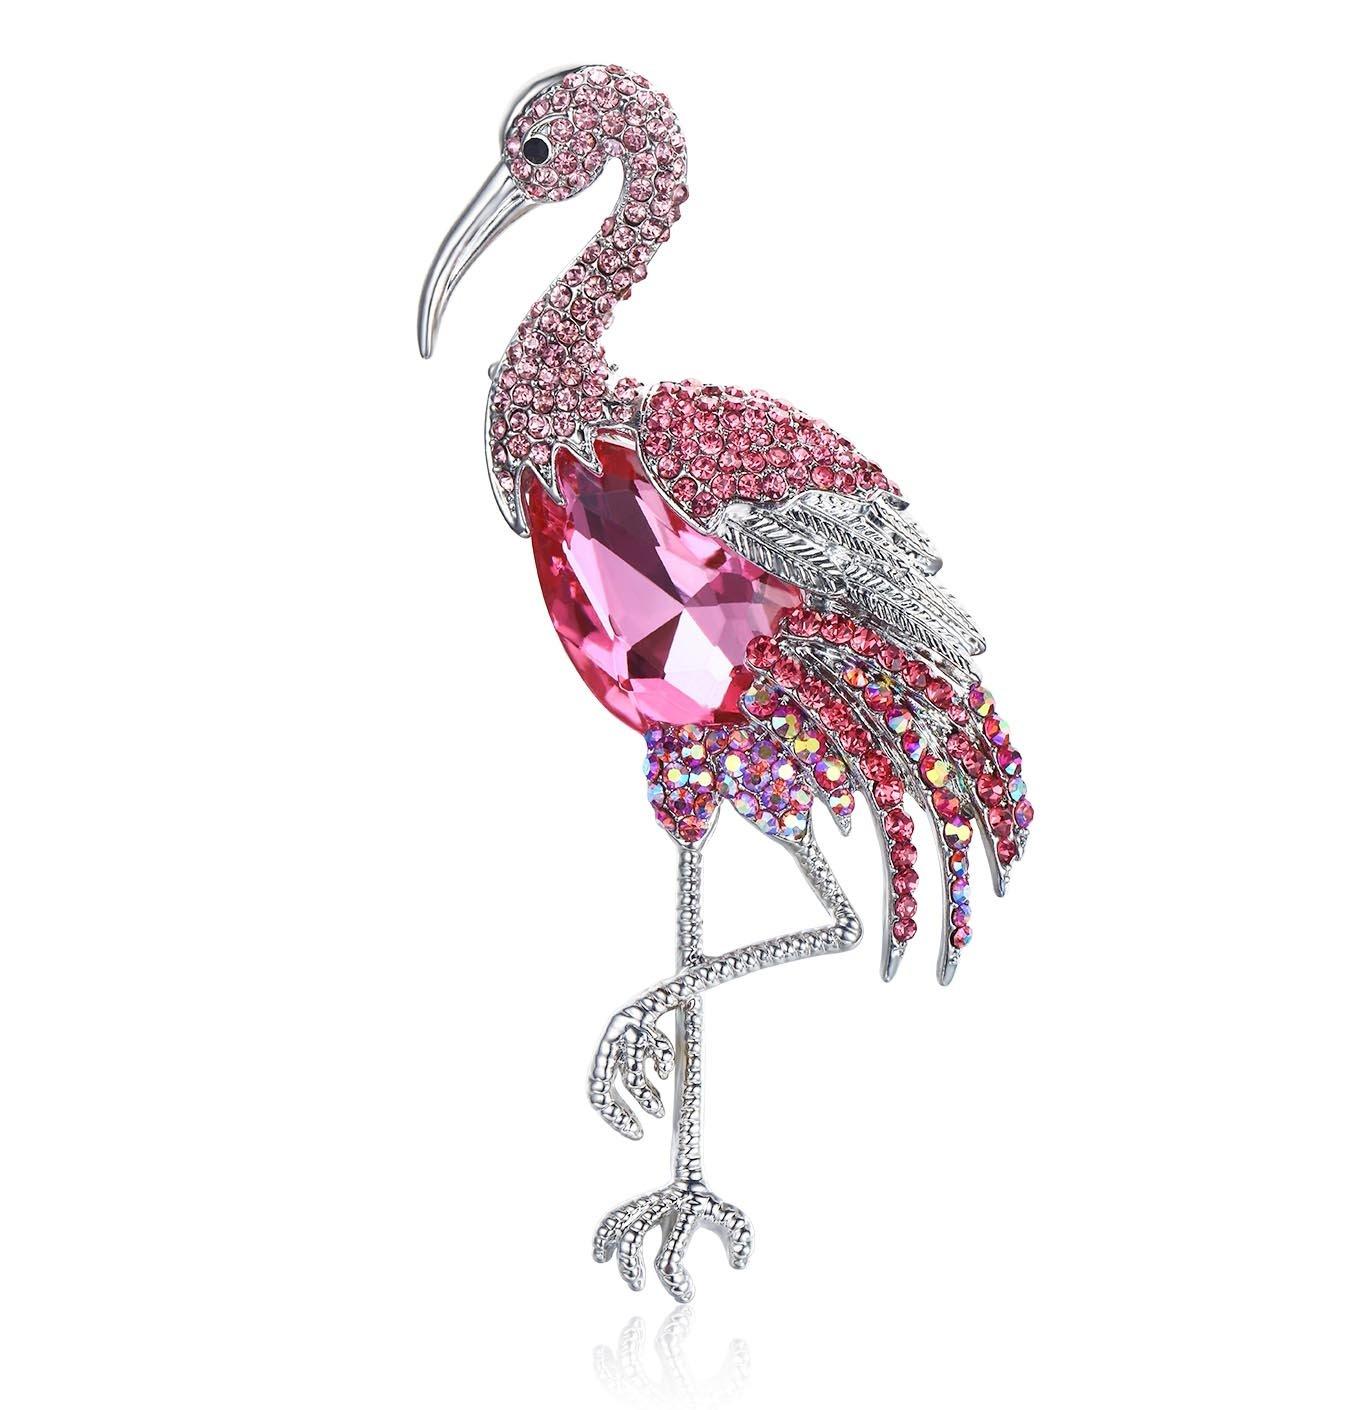 Janefashions 4-INCH FLAMINGO HOT PINK AUSTRIAN RHINESTONE CRYSTAL BROOCH PIN ANIMALS B1615HP (Pink)